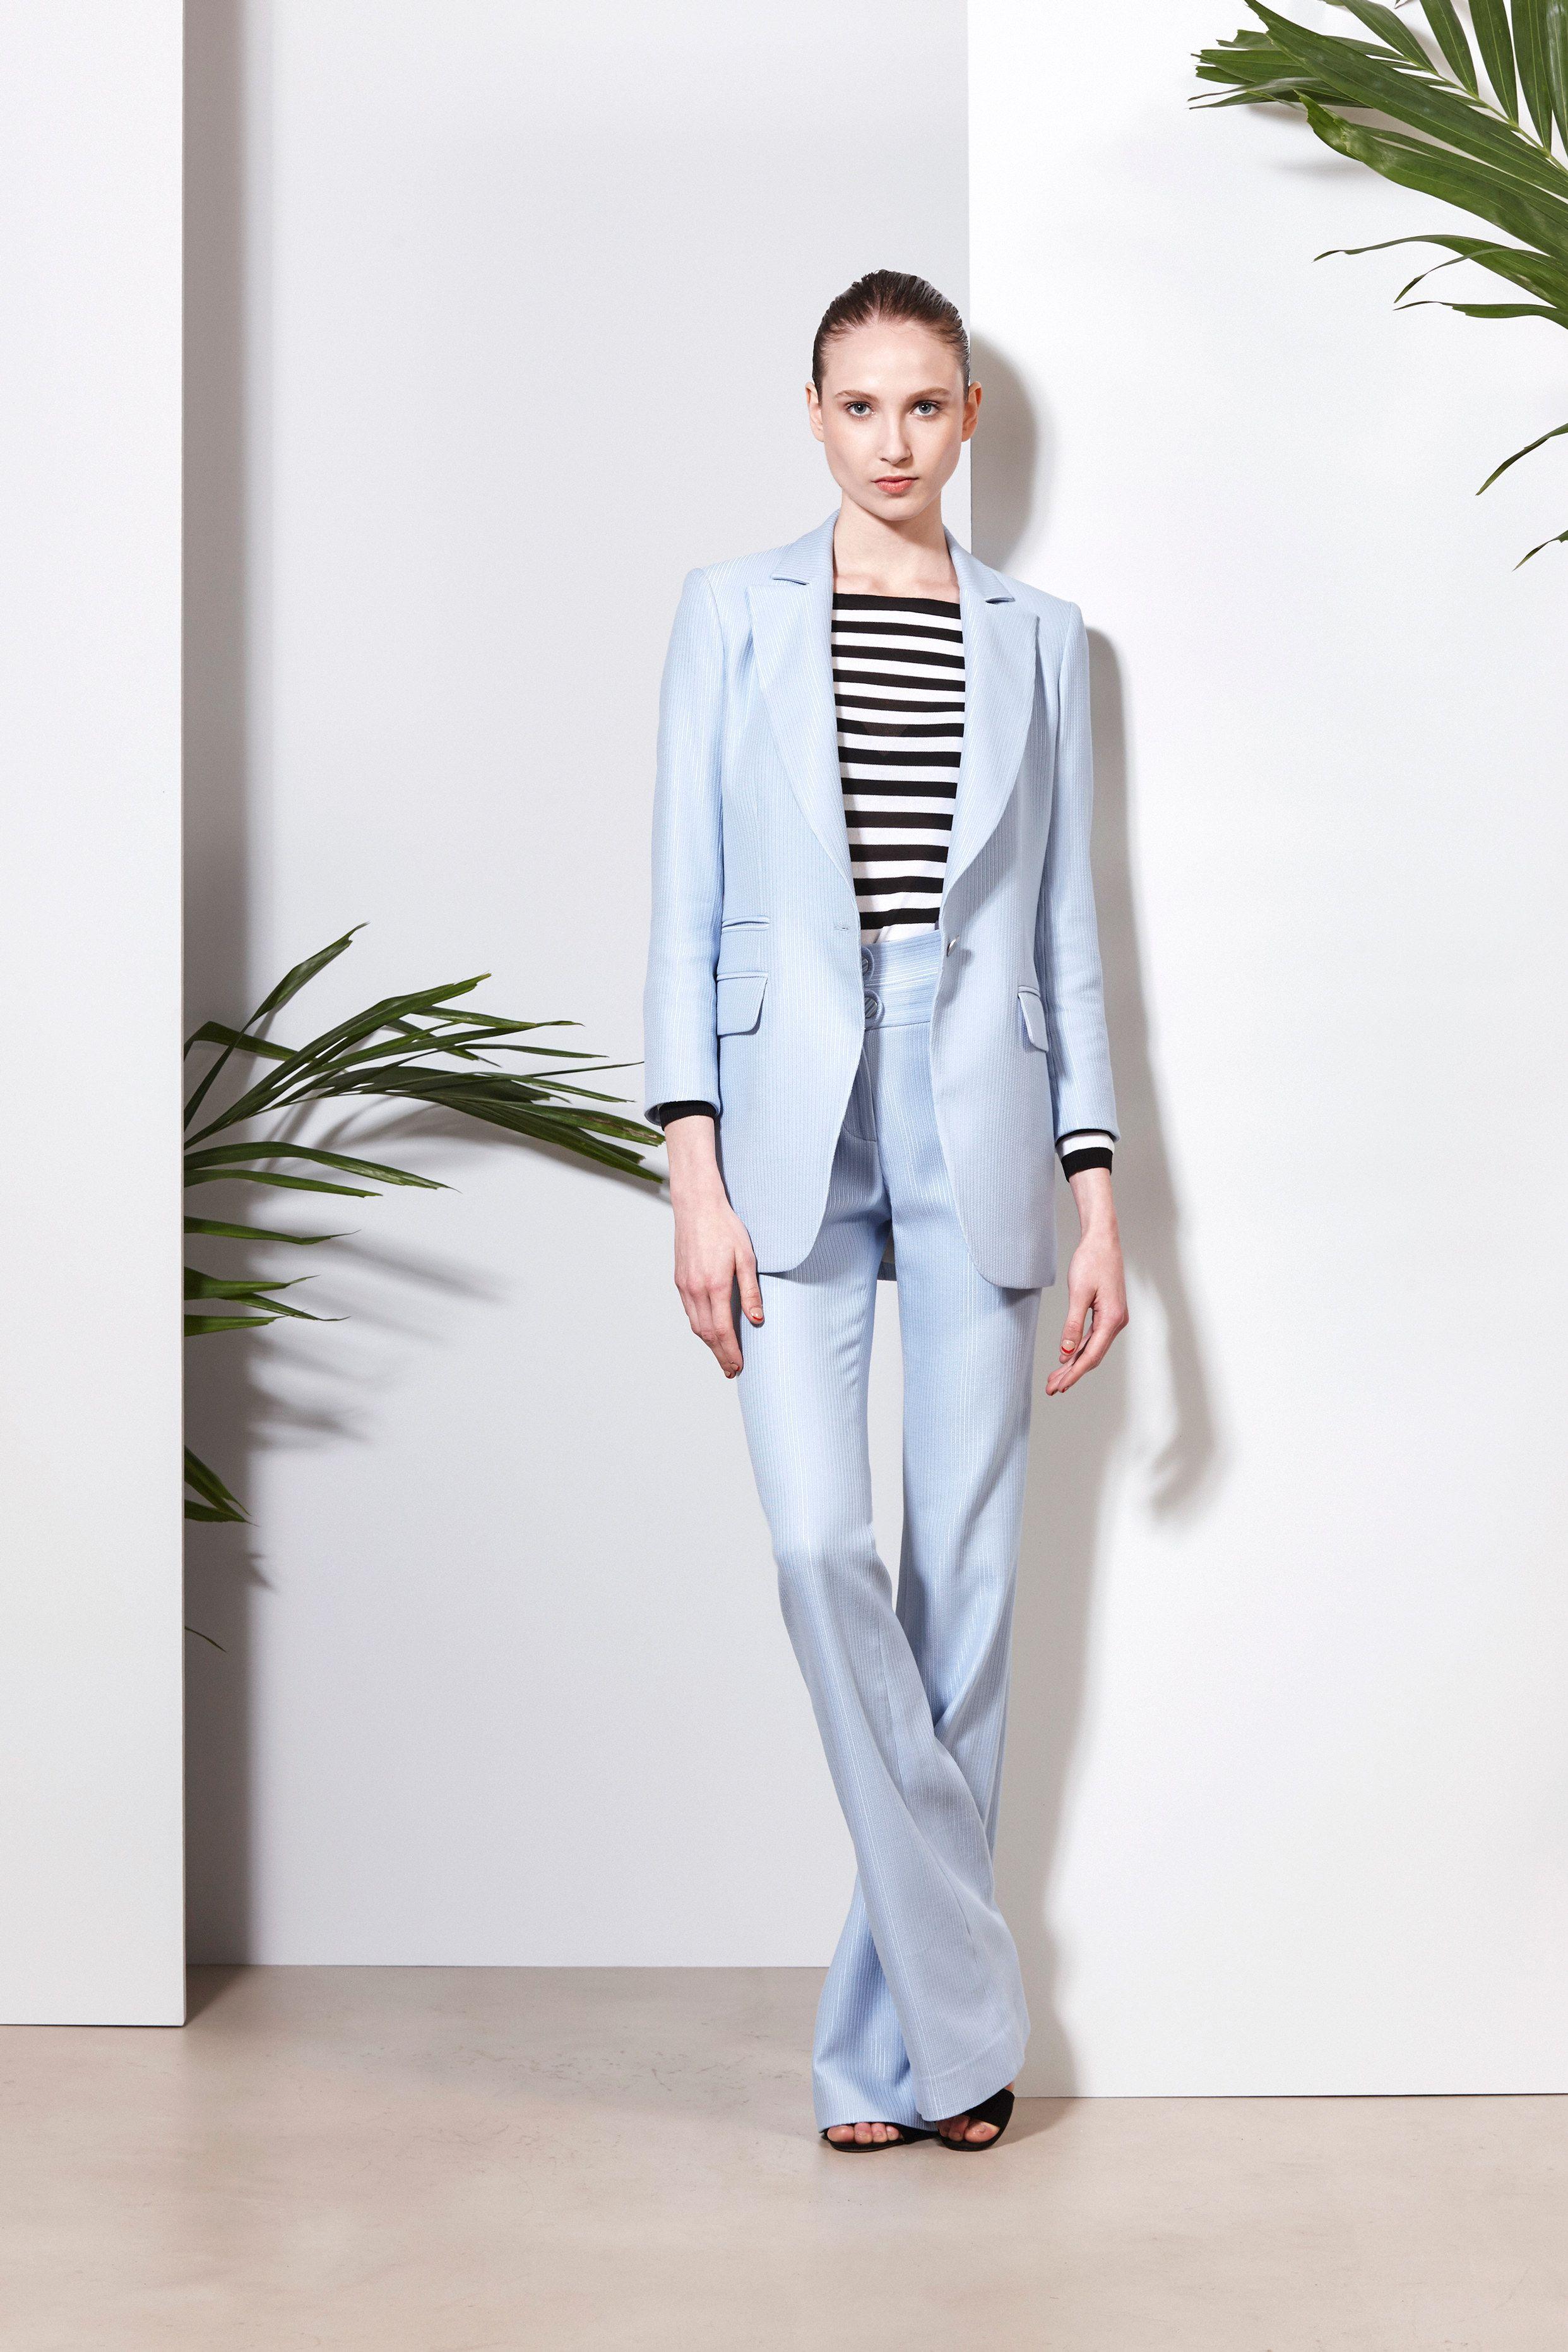 Veronica Beard Spring 2016 Ready-to-Wear Fashion Show